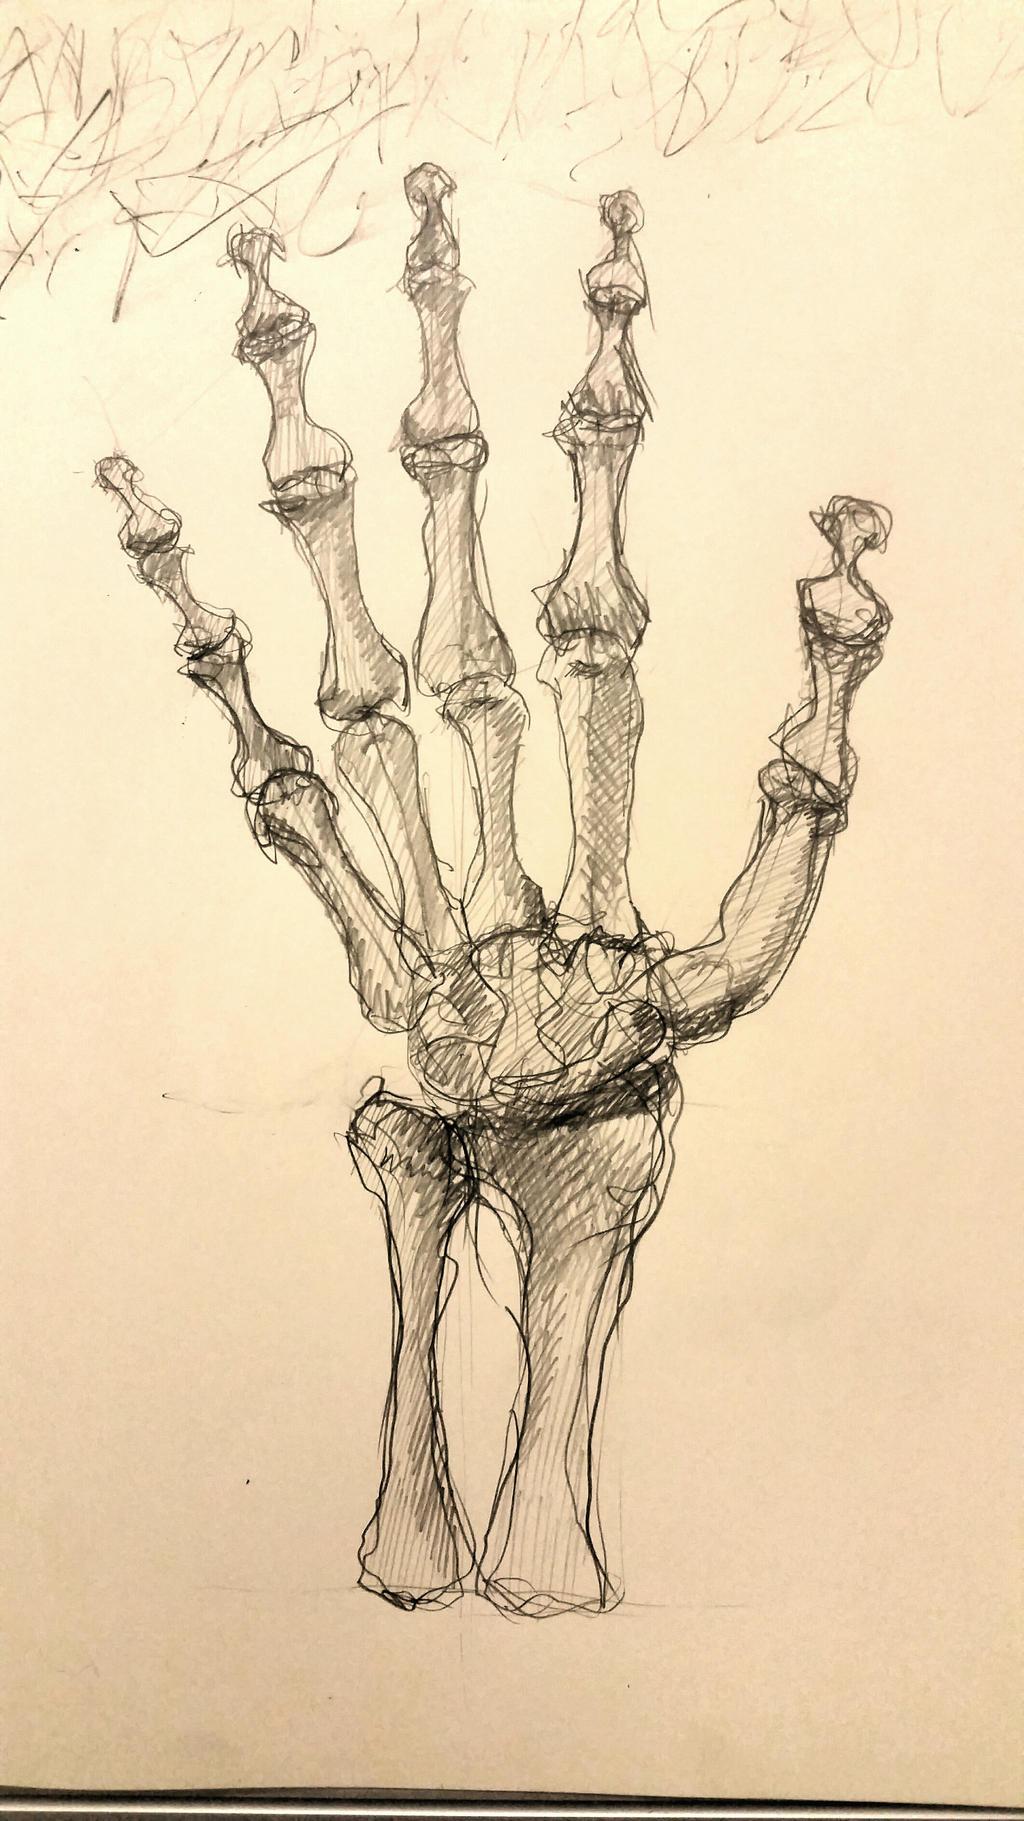 sketch by desenez88